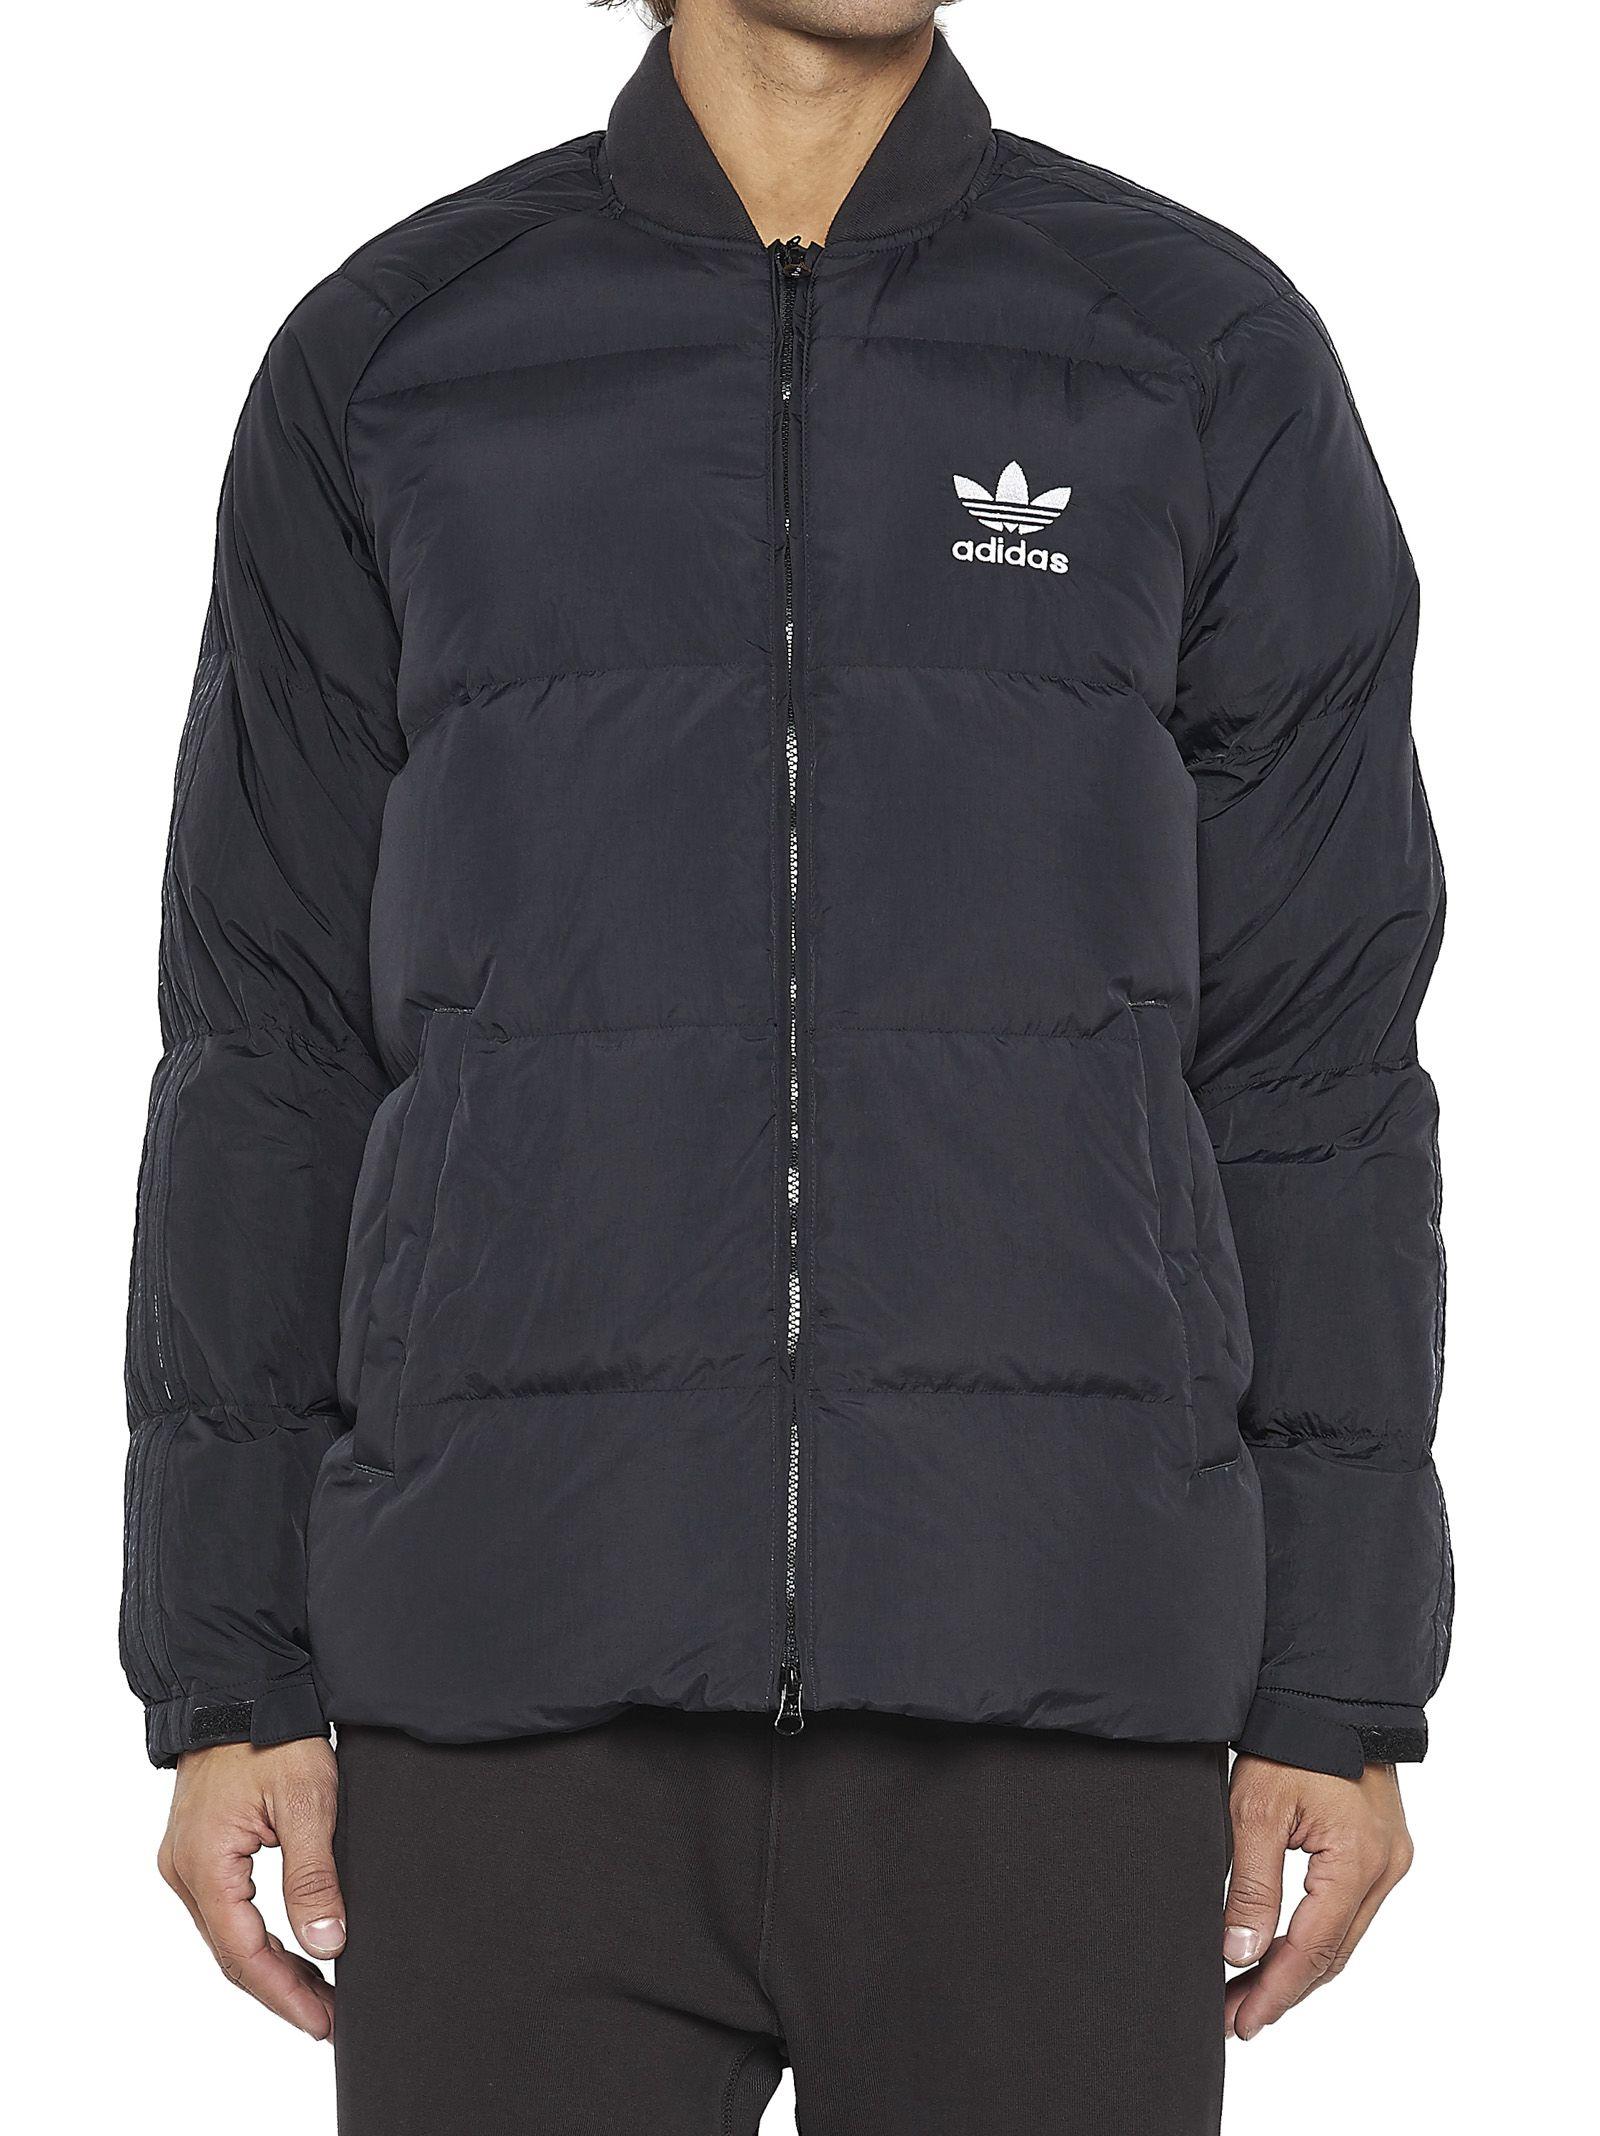 Adidas Originals Down Jacket